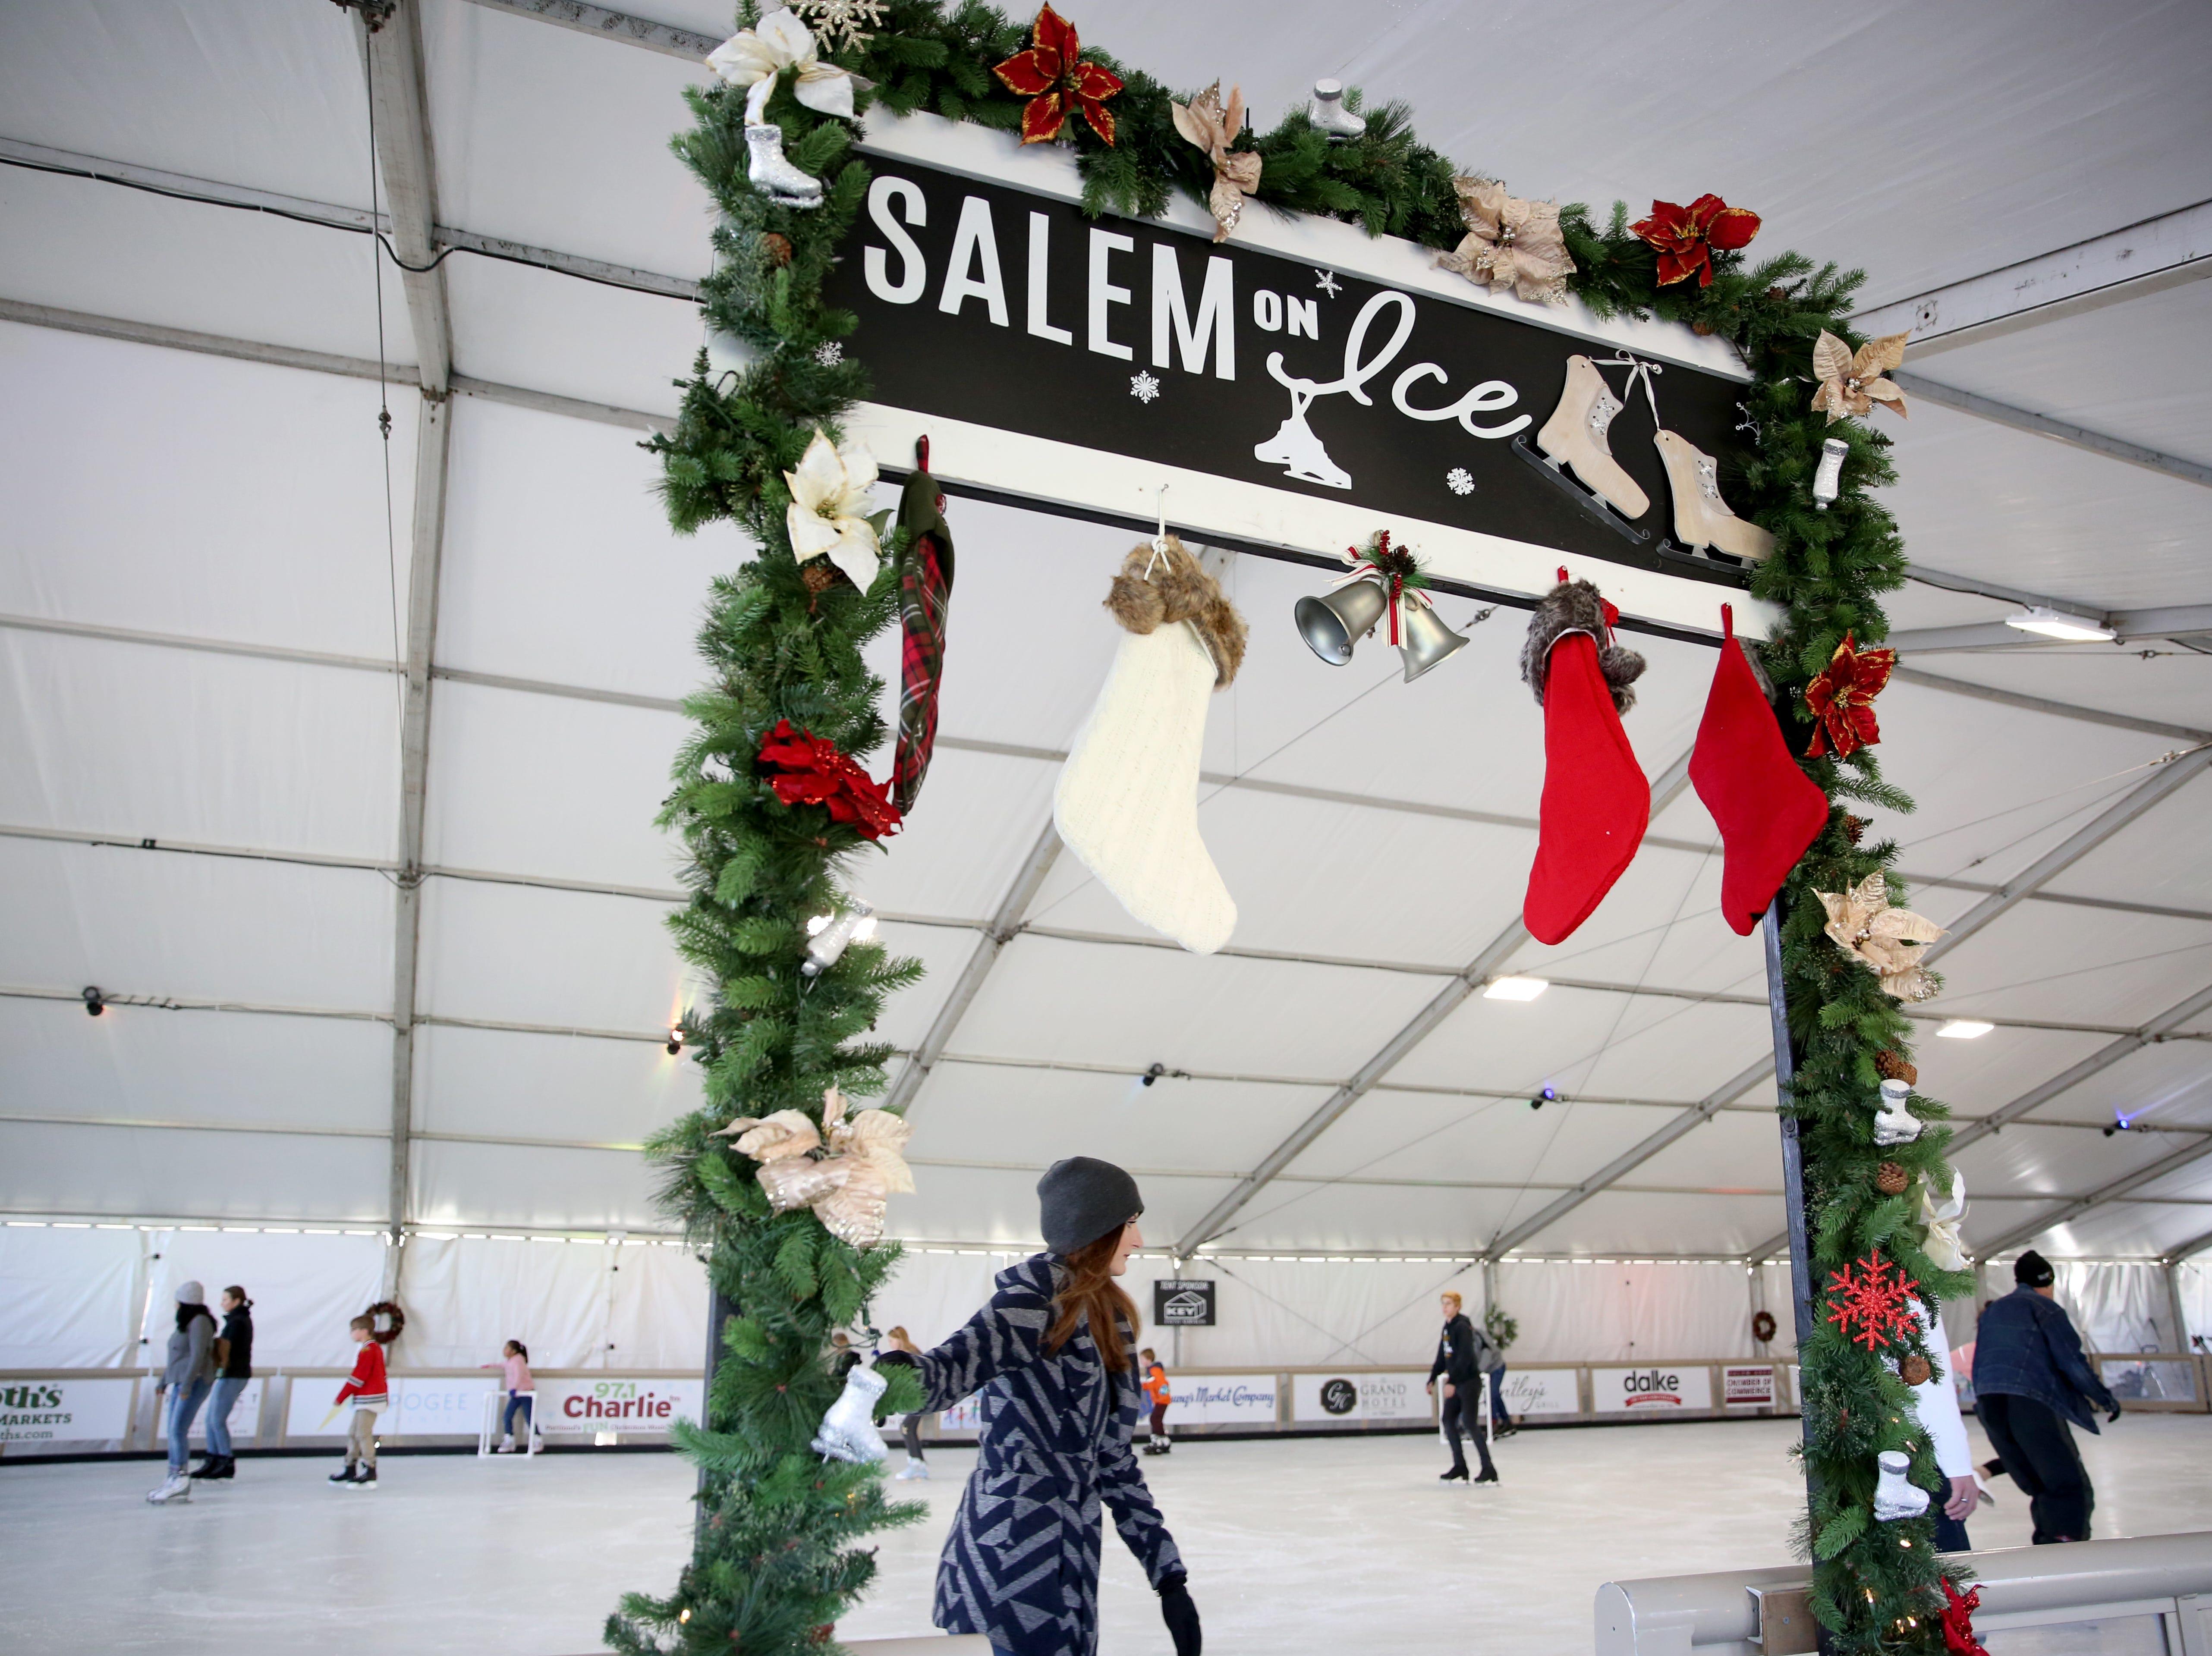 Skaters enter the rink on opening weekend at Salem On Ice in at Riverfront Park on Sunday, Nov. 18, 2018, in Salem.